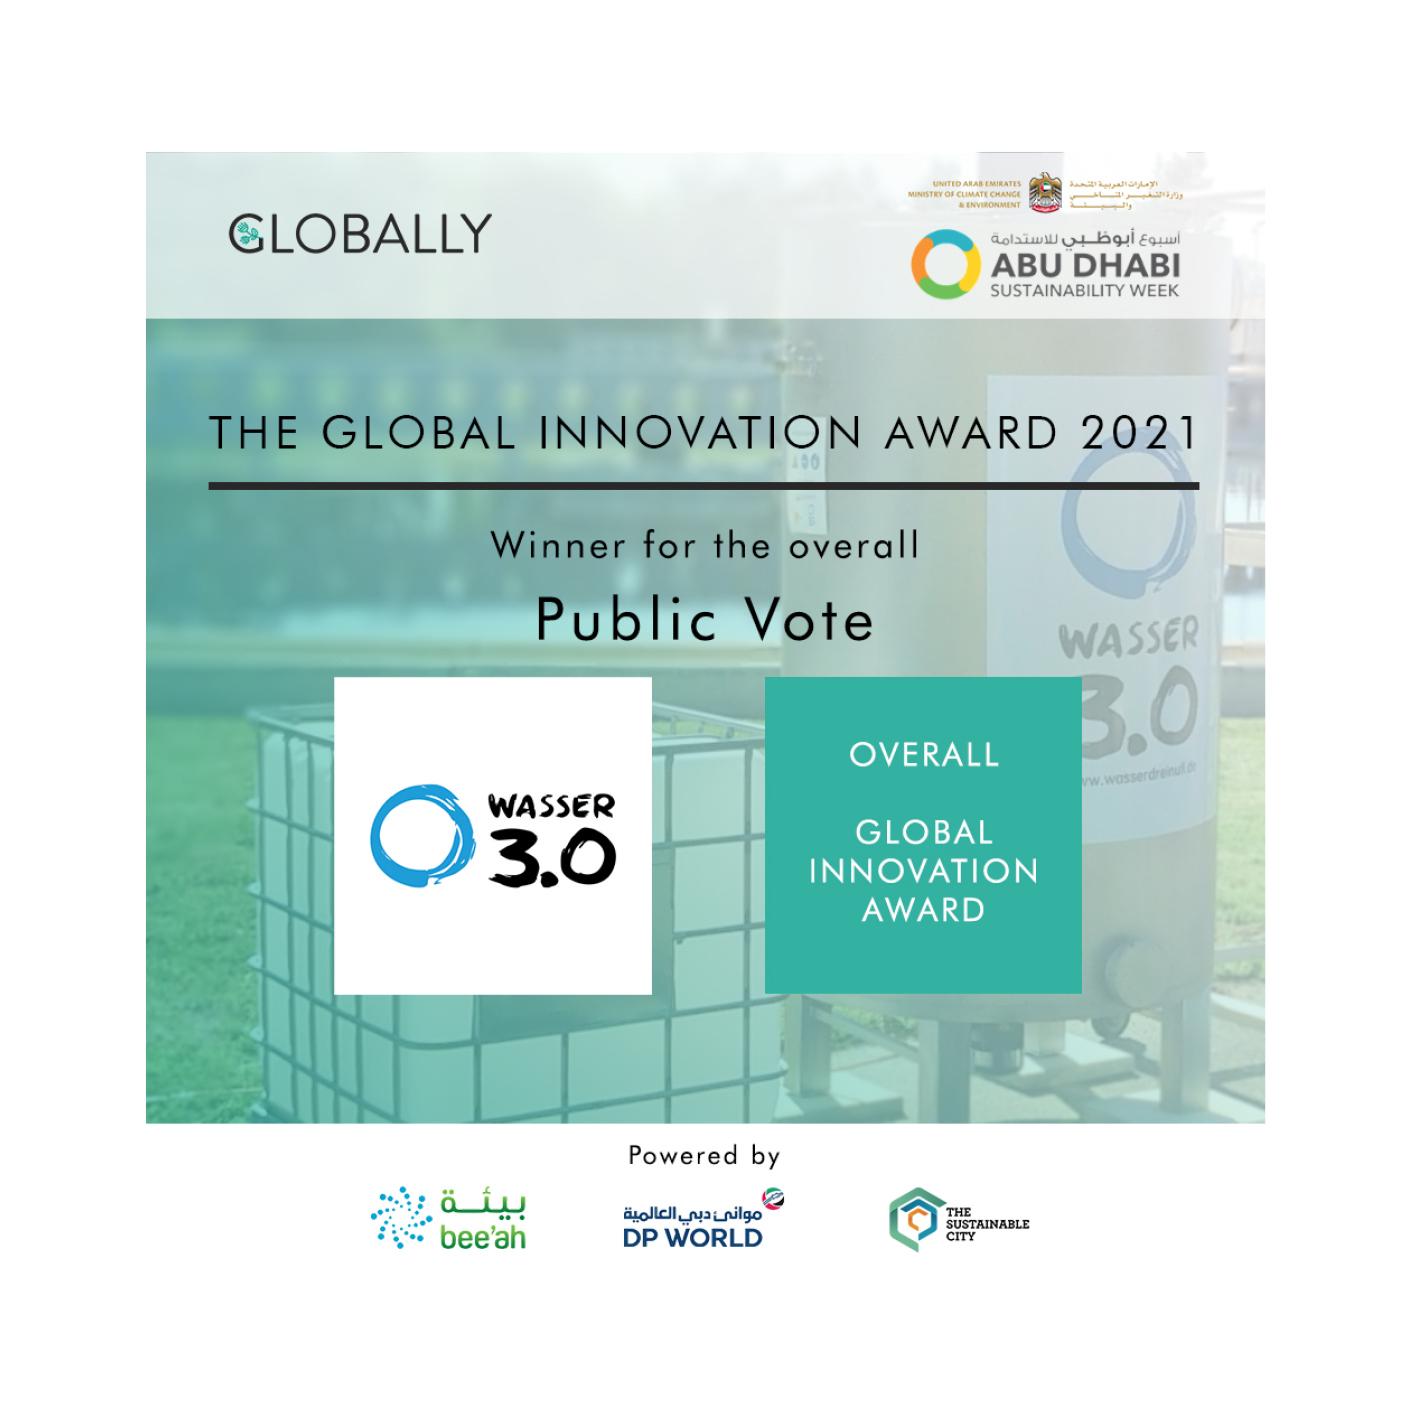 Global Innovation Award 2020